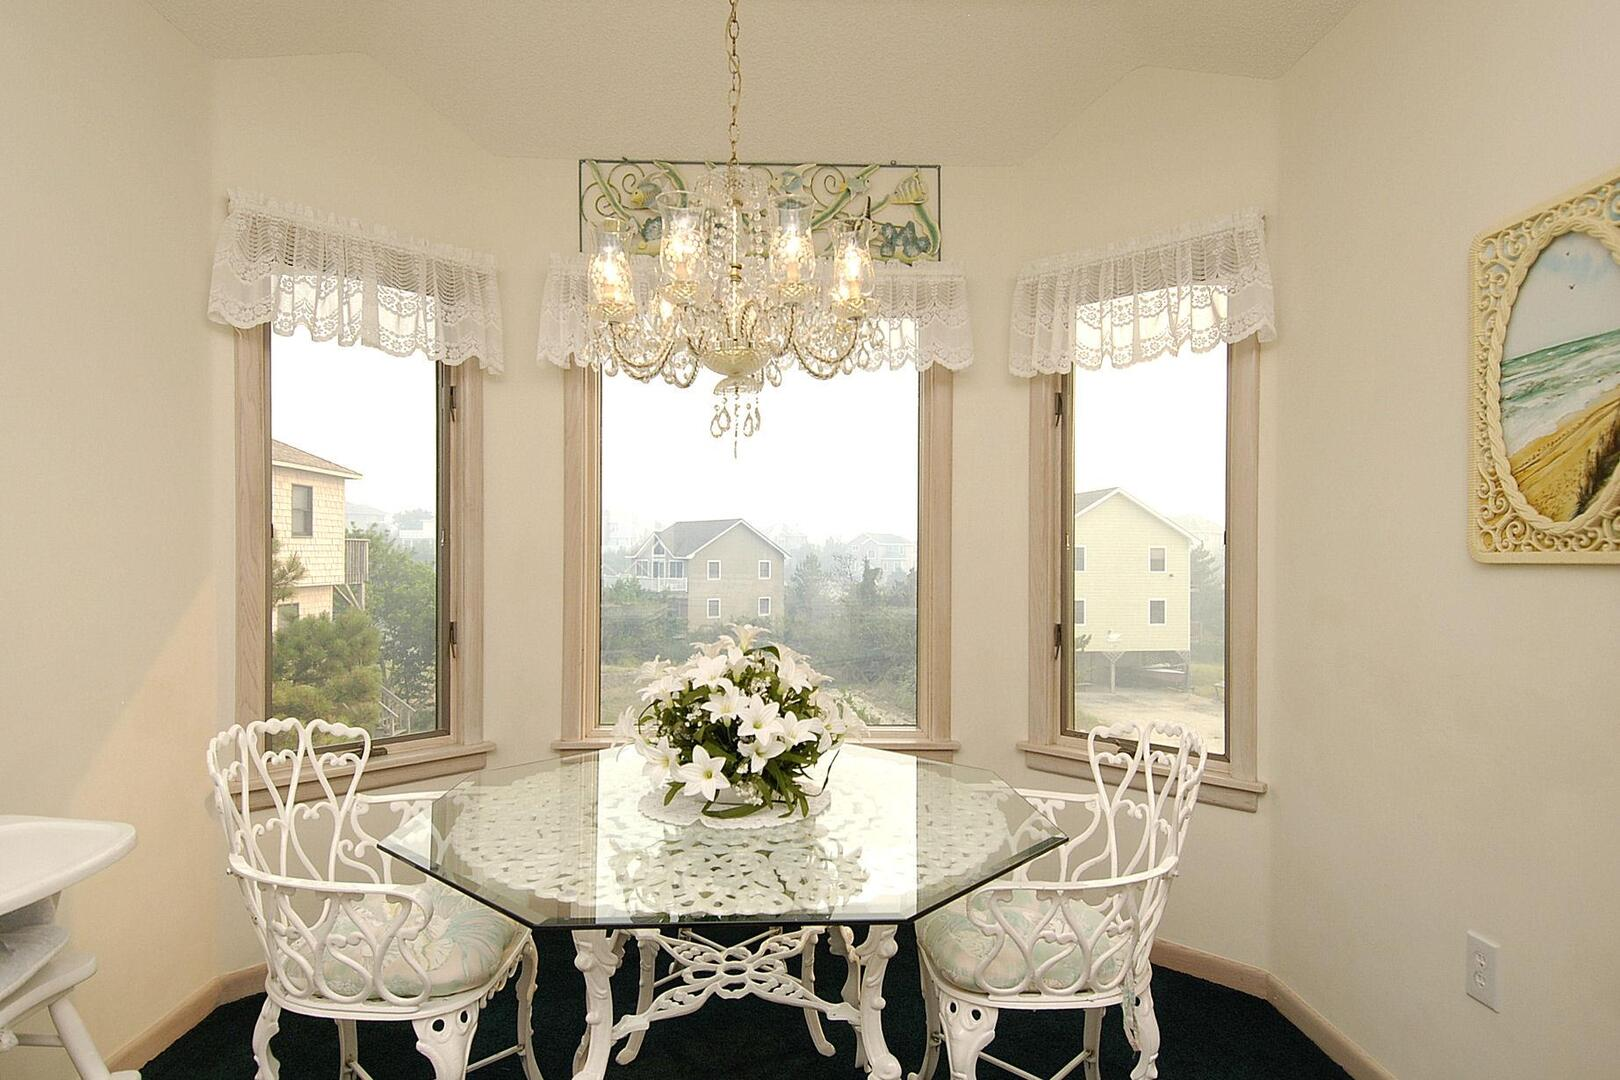 Upper/Main Level,Breakfast Room,Breakfast Room